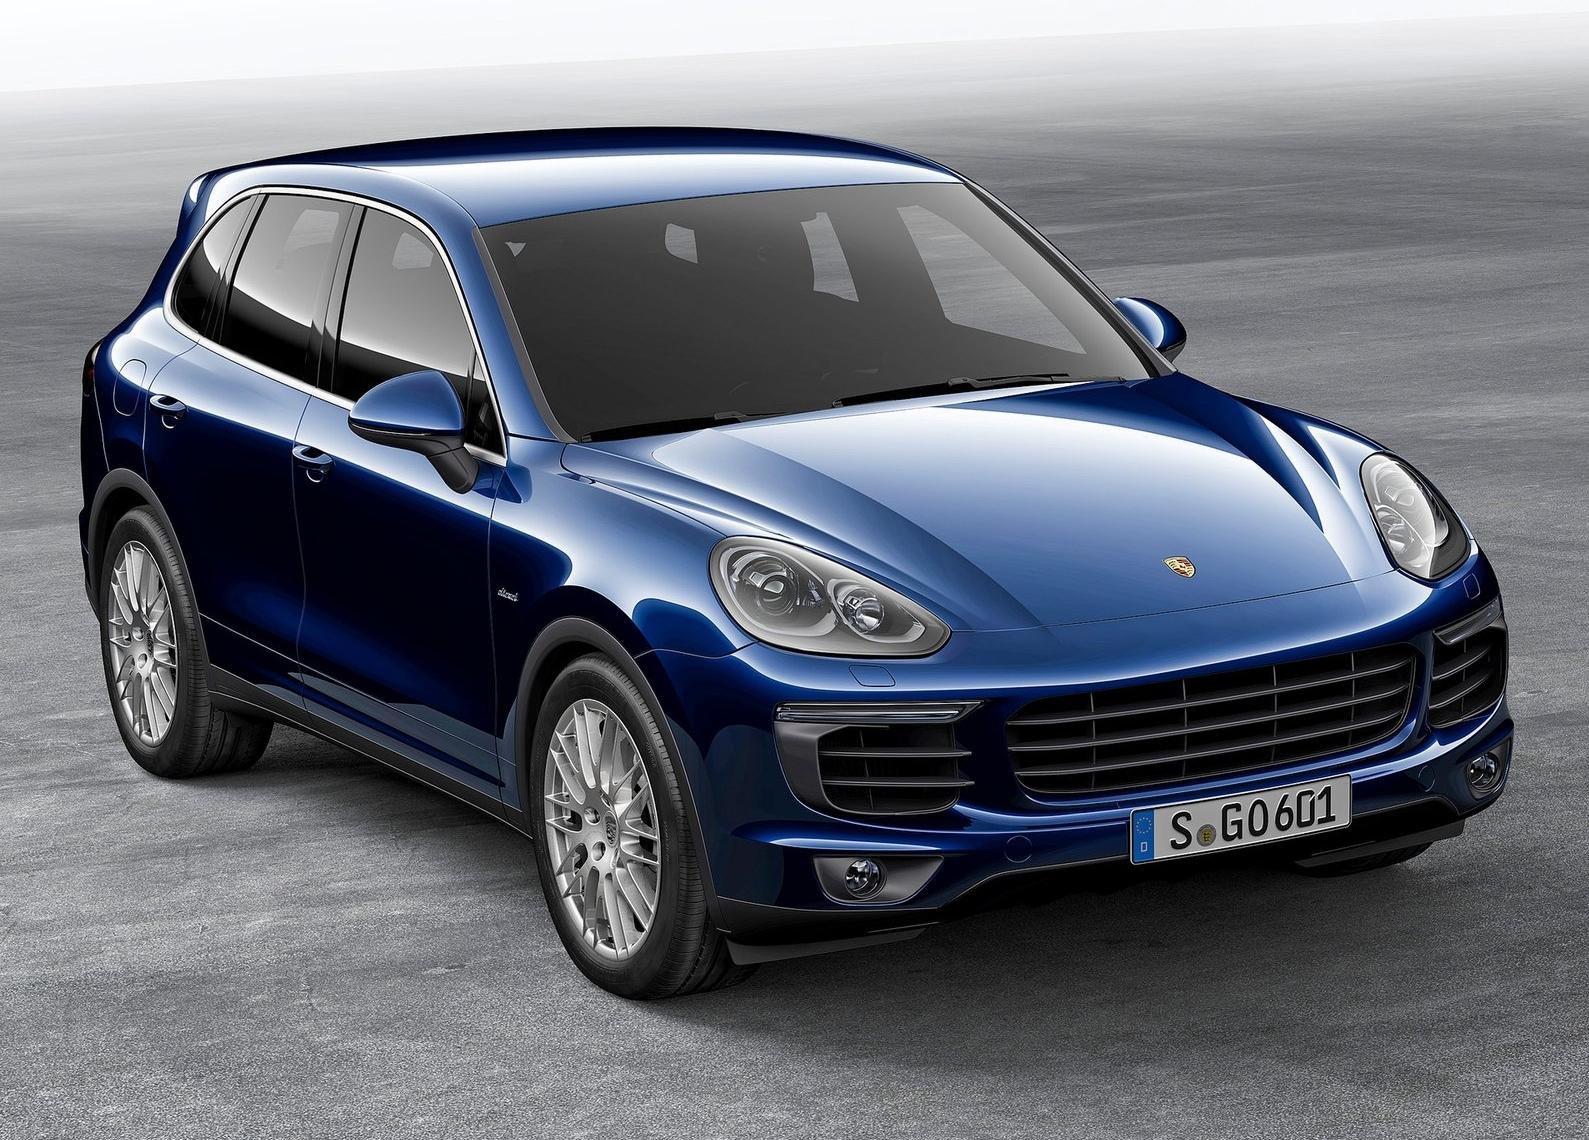 https://www.whatcar.lv/cars/Porsche/Cayenne/2a8cdf0c3c2be73f3c80f0feb9c868d0.jpg